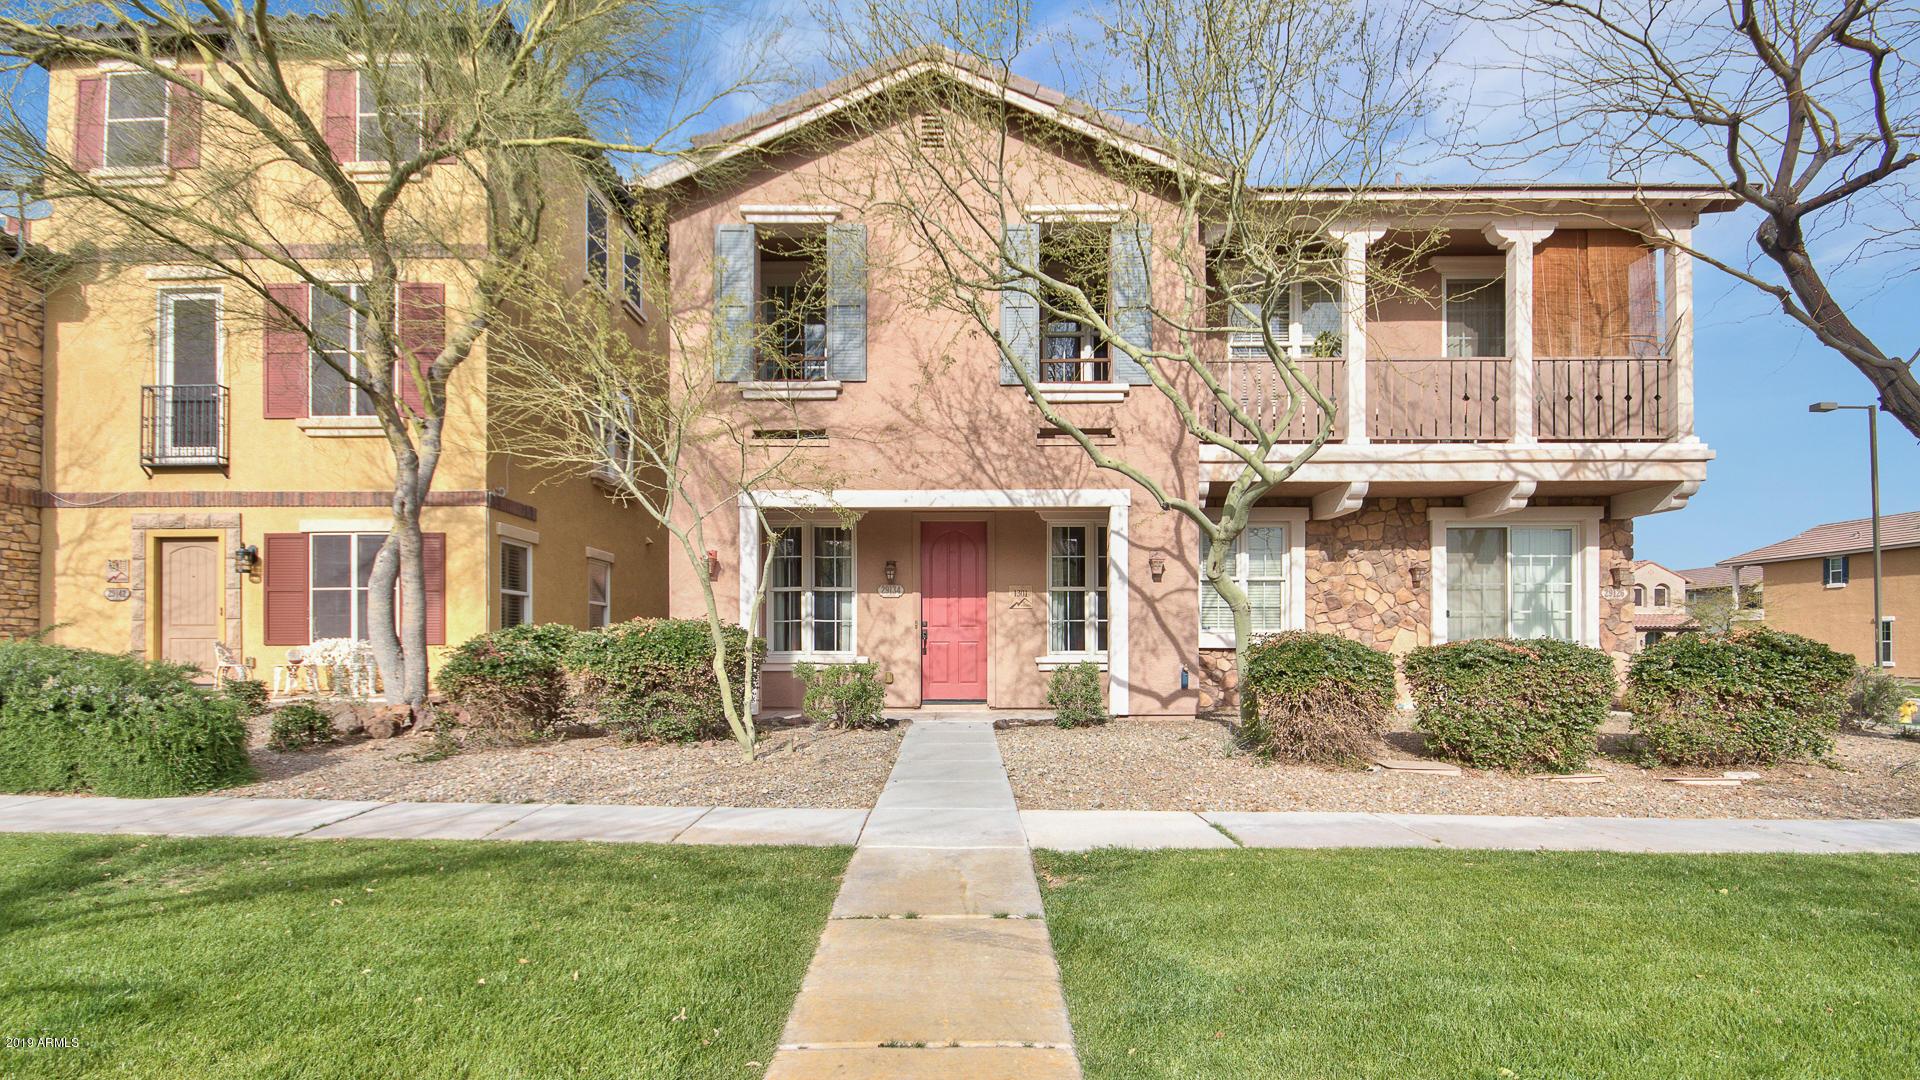 29134 N 125TH Avenue, Vistancia in Maricopa County, AZ 85383 Home for Sale